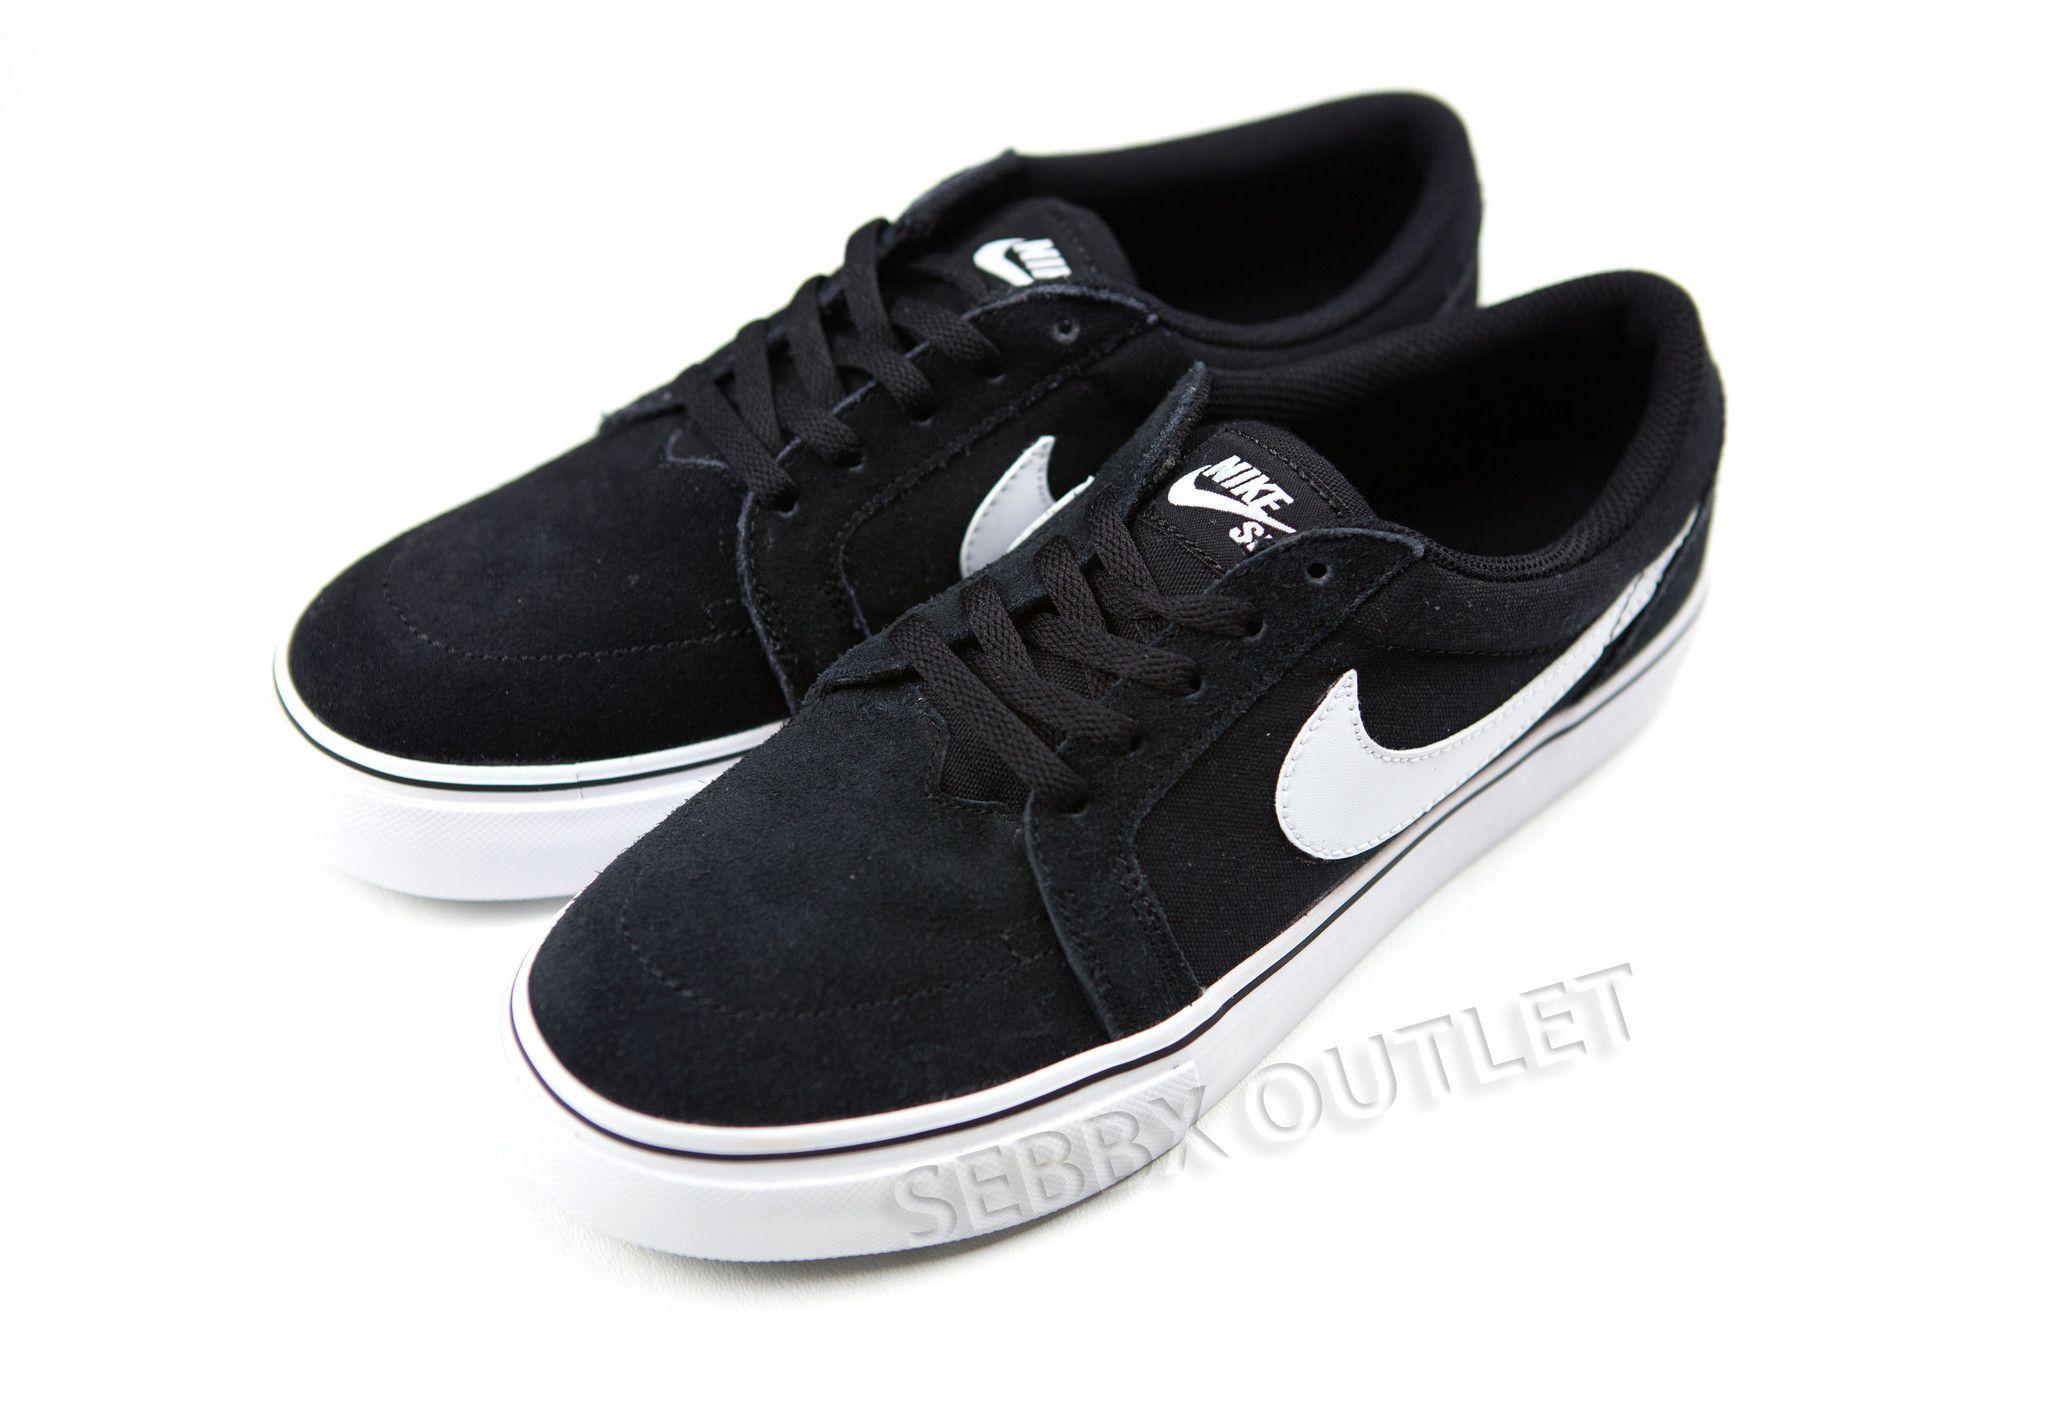 the latest 21c3d 65b78 Nike Sneakers Nike Satire II (GS) Black 729810 001